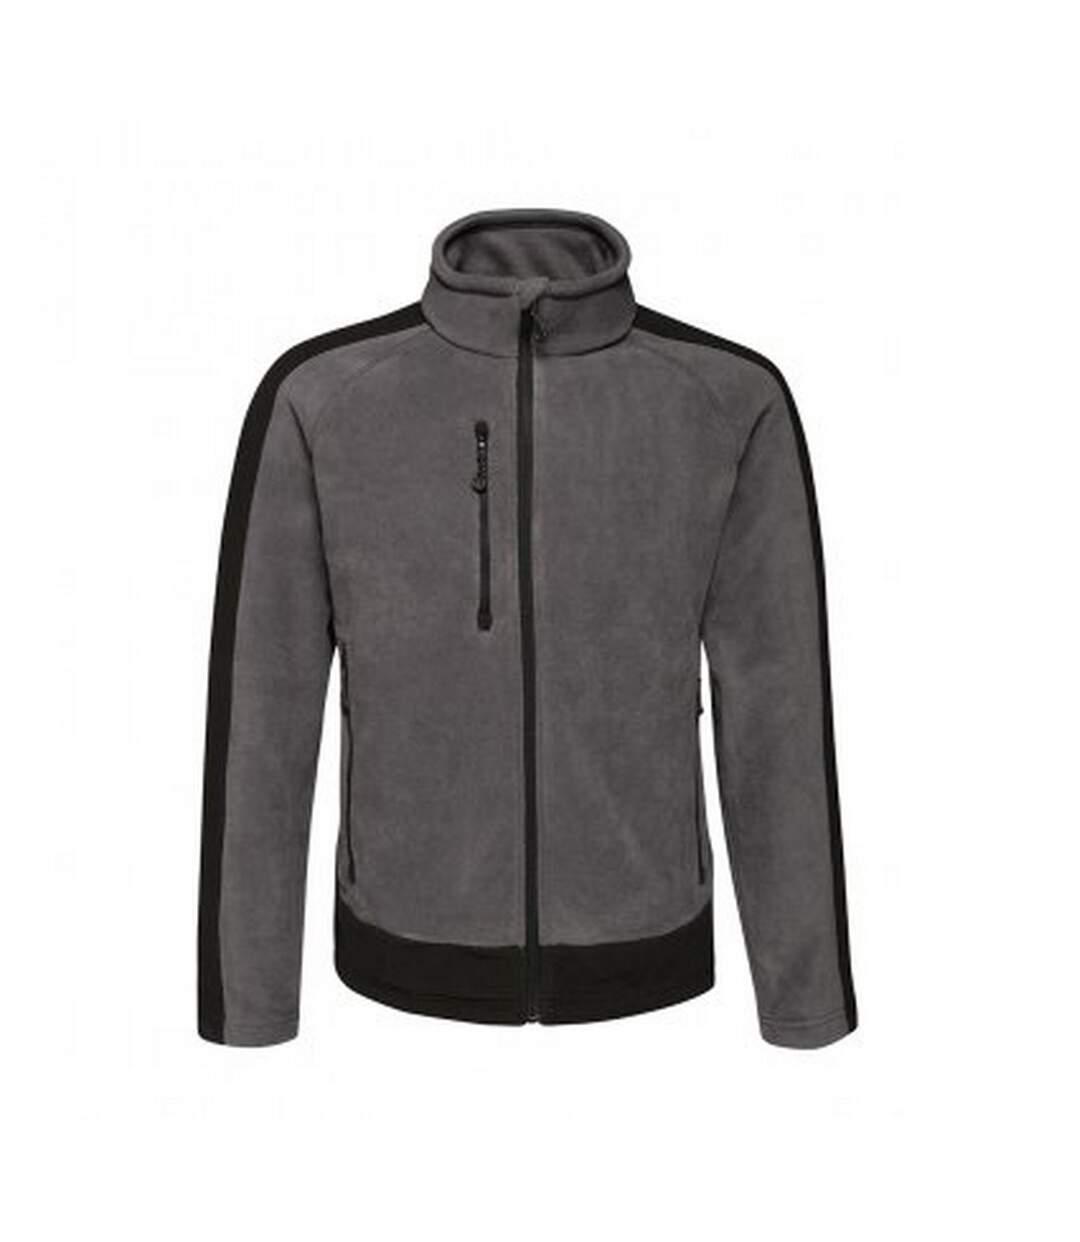 Regatta Mens Contrast 300 Fleece Jacket (Seal Grey/Black) - UTPC3319